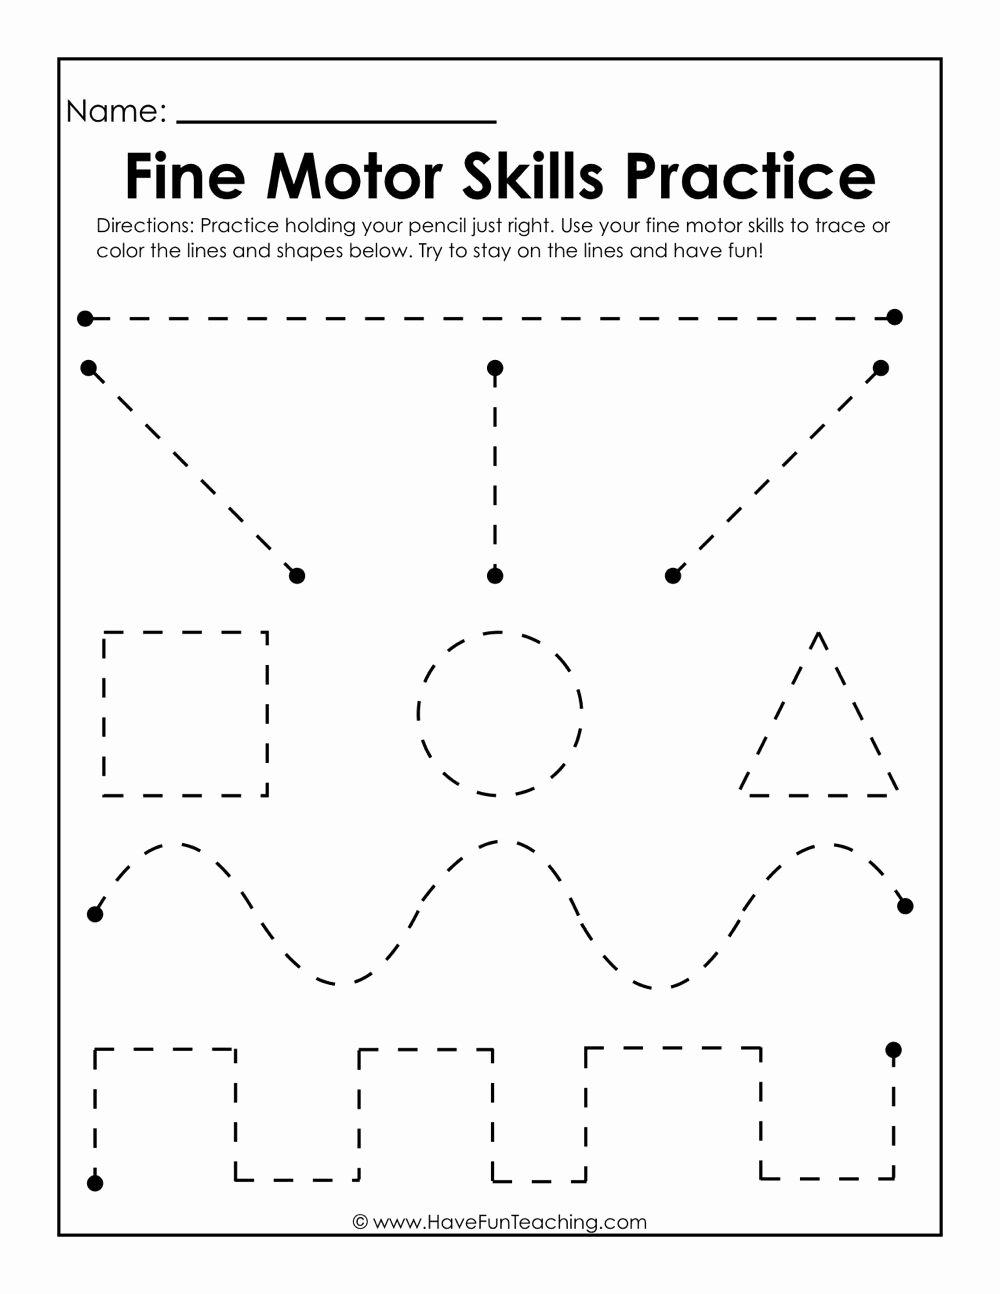 Fine Motor Skills Worksheets for Preschoolers Printable Fine Motor Skills Practice Worksheet